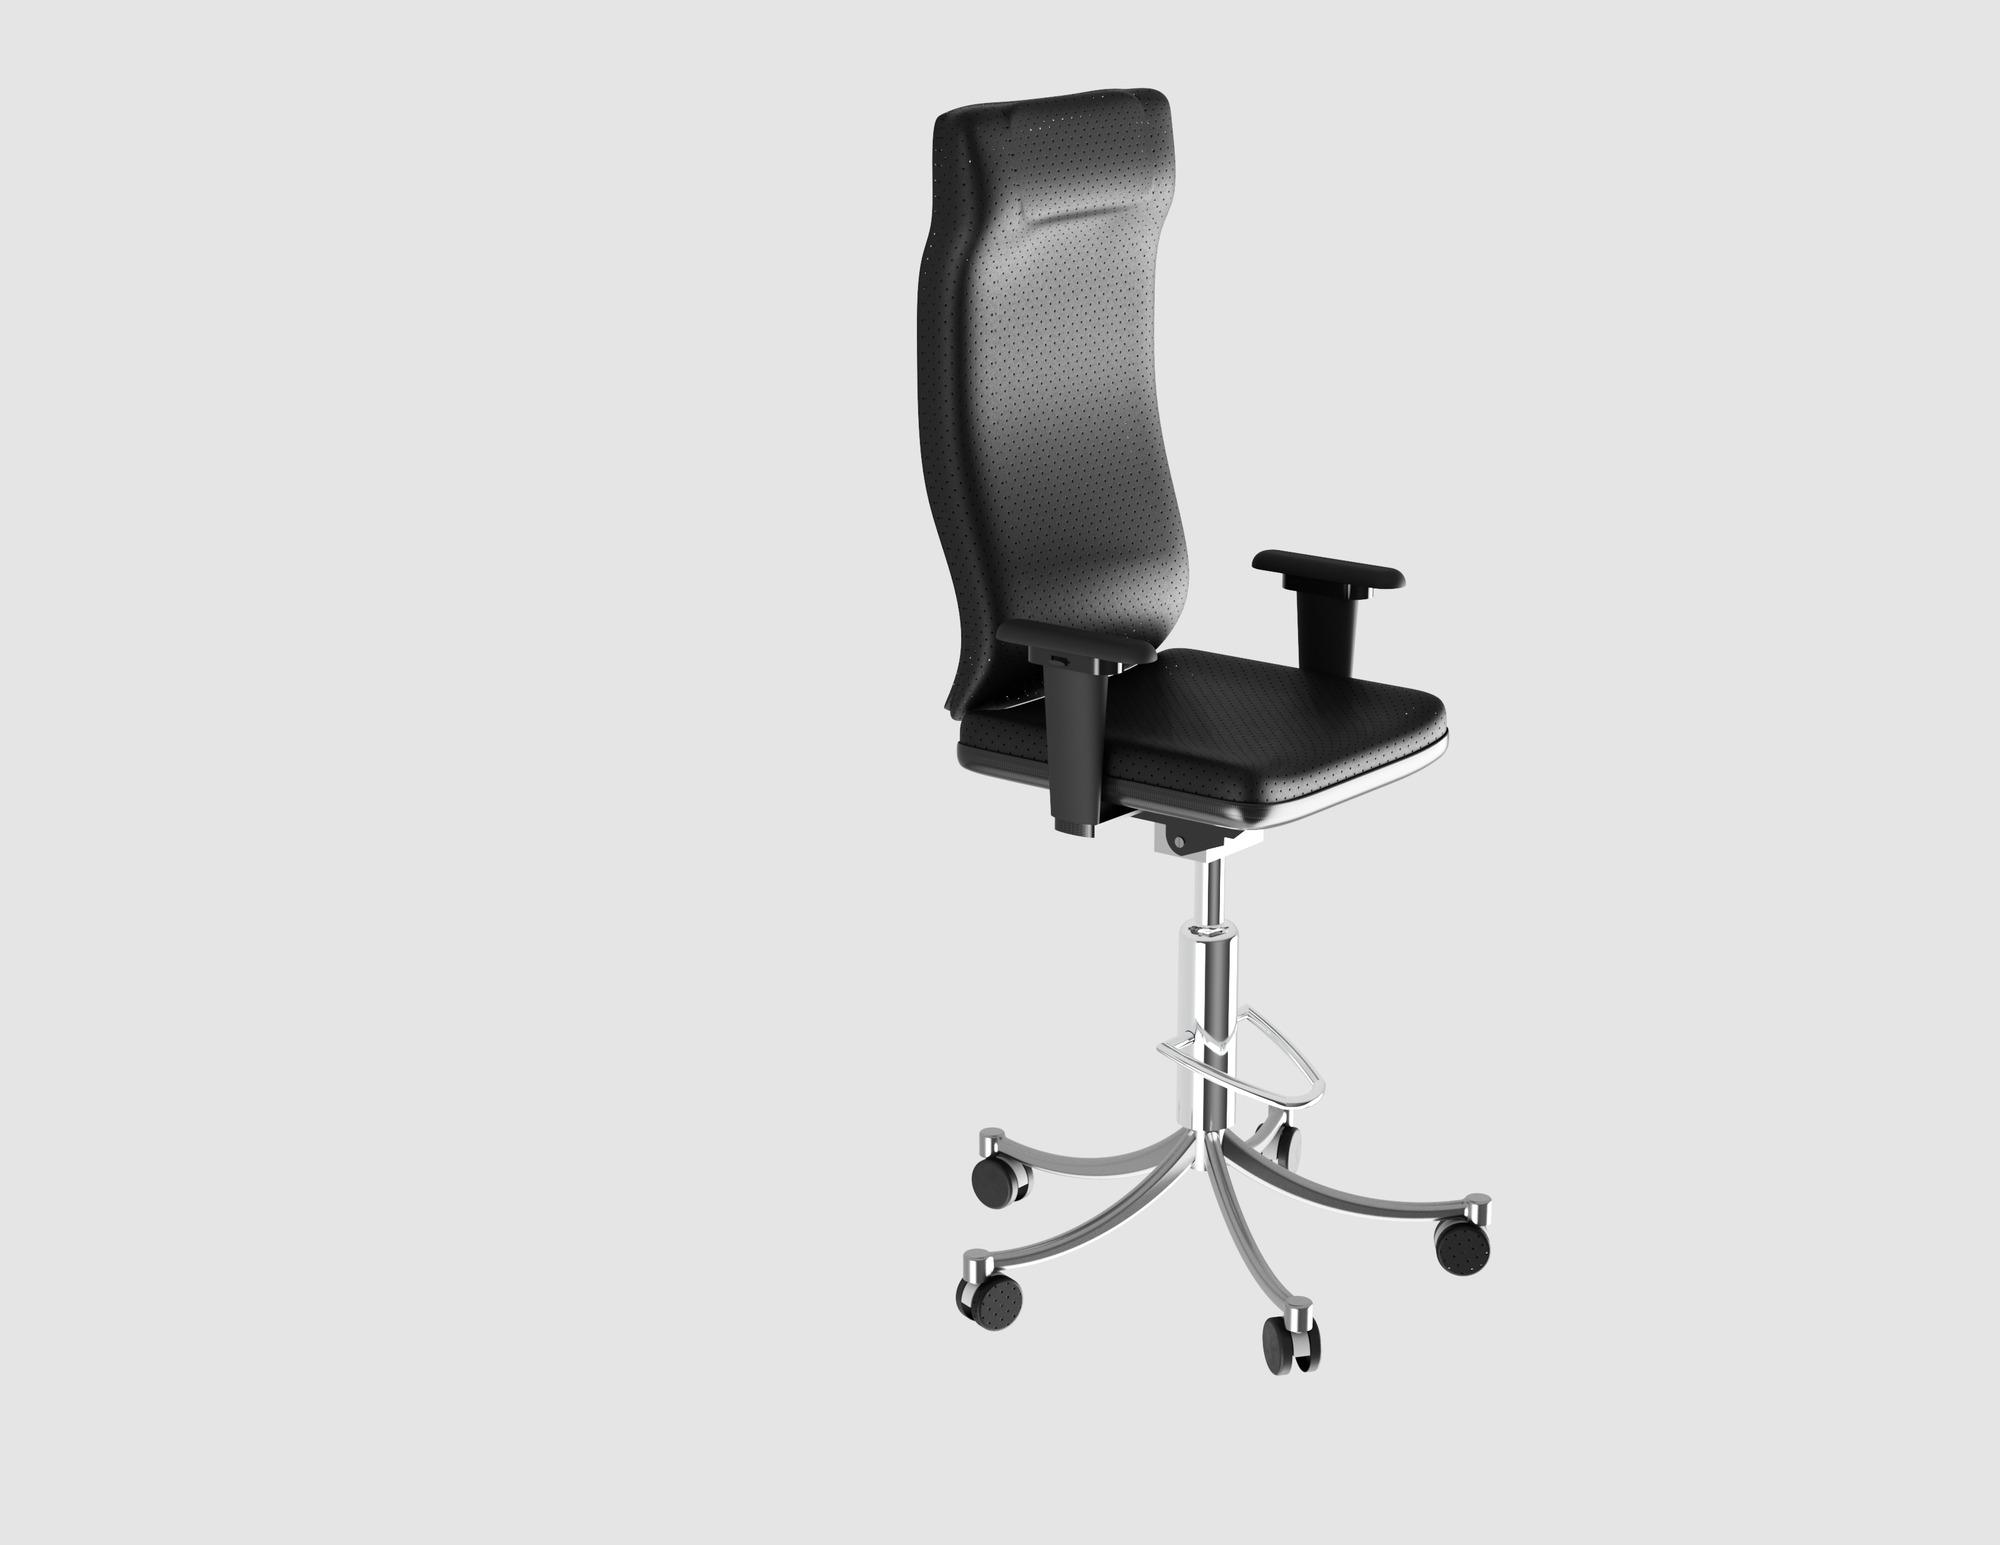 ergonomic chair trial wheelchair lightweight office autodesk online gallery